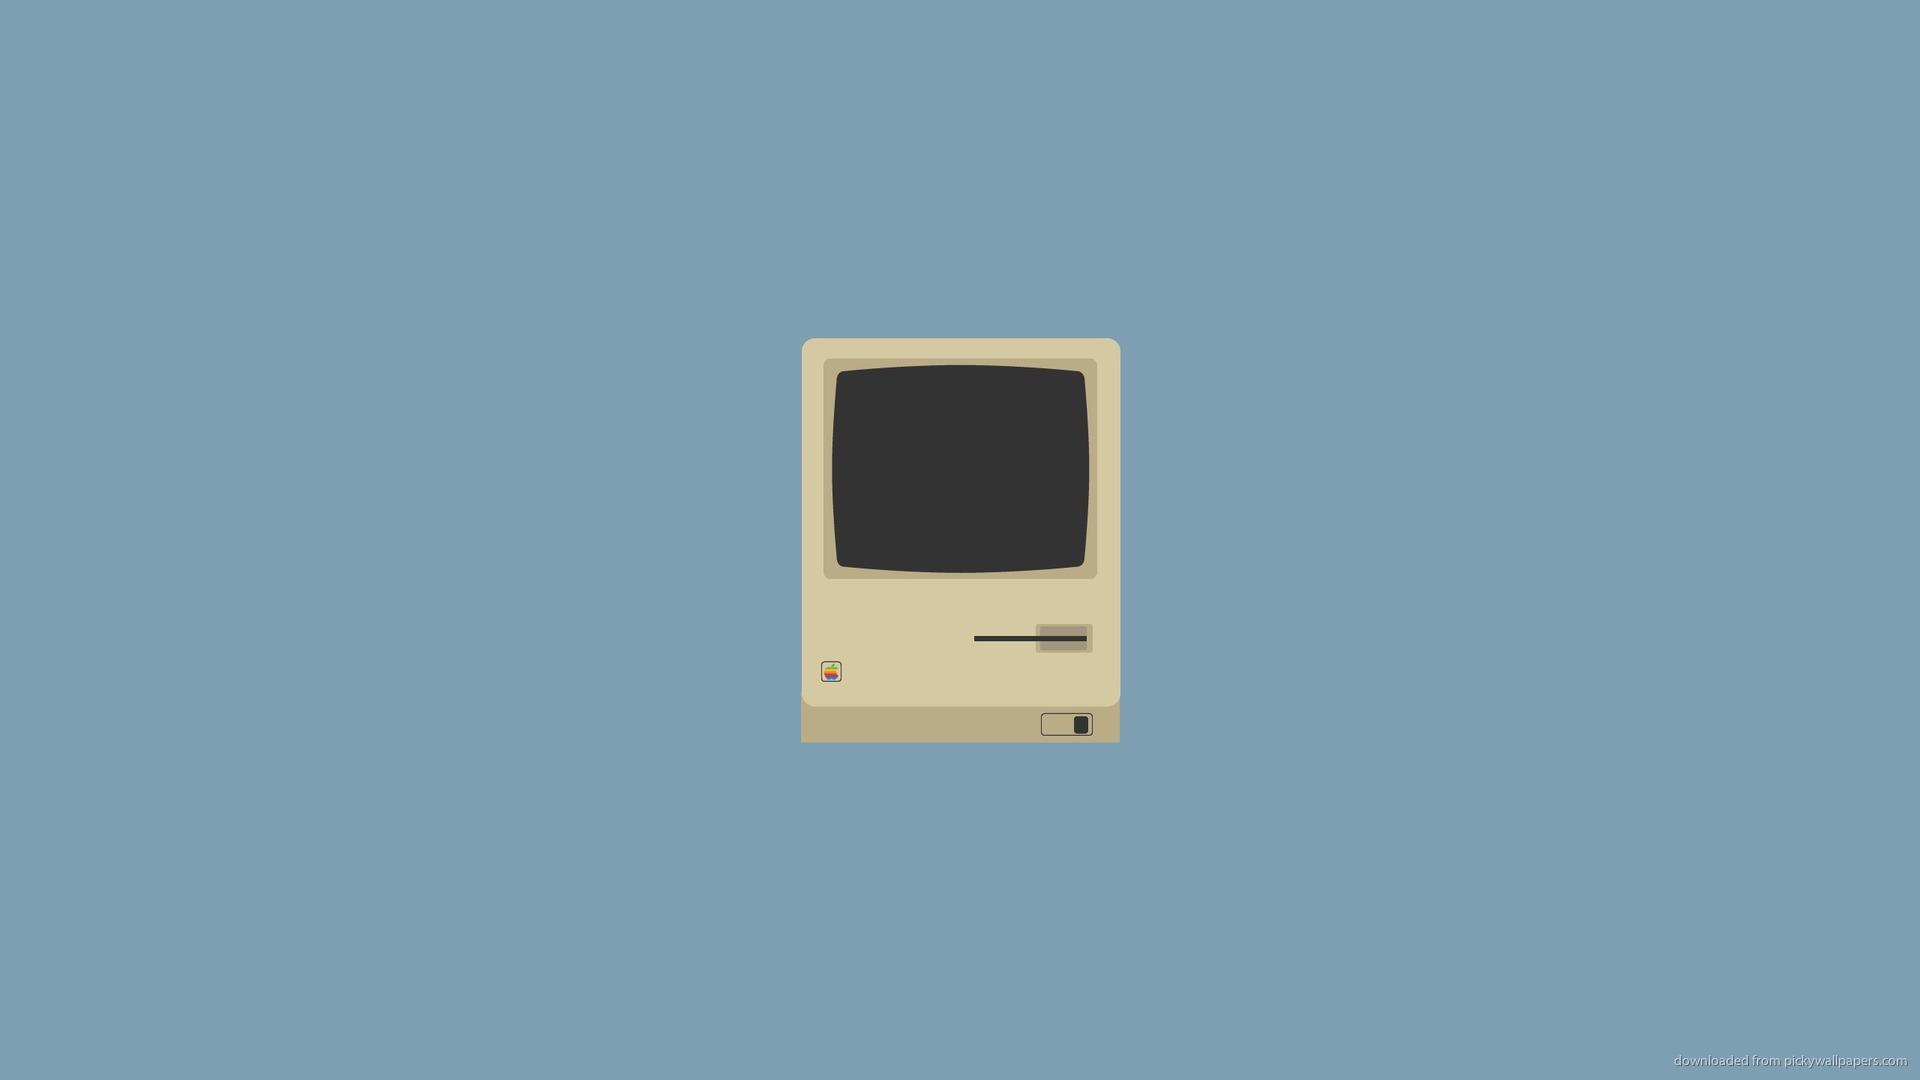 Hd box for mac computers